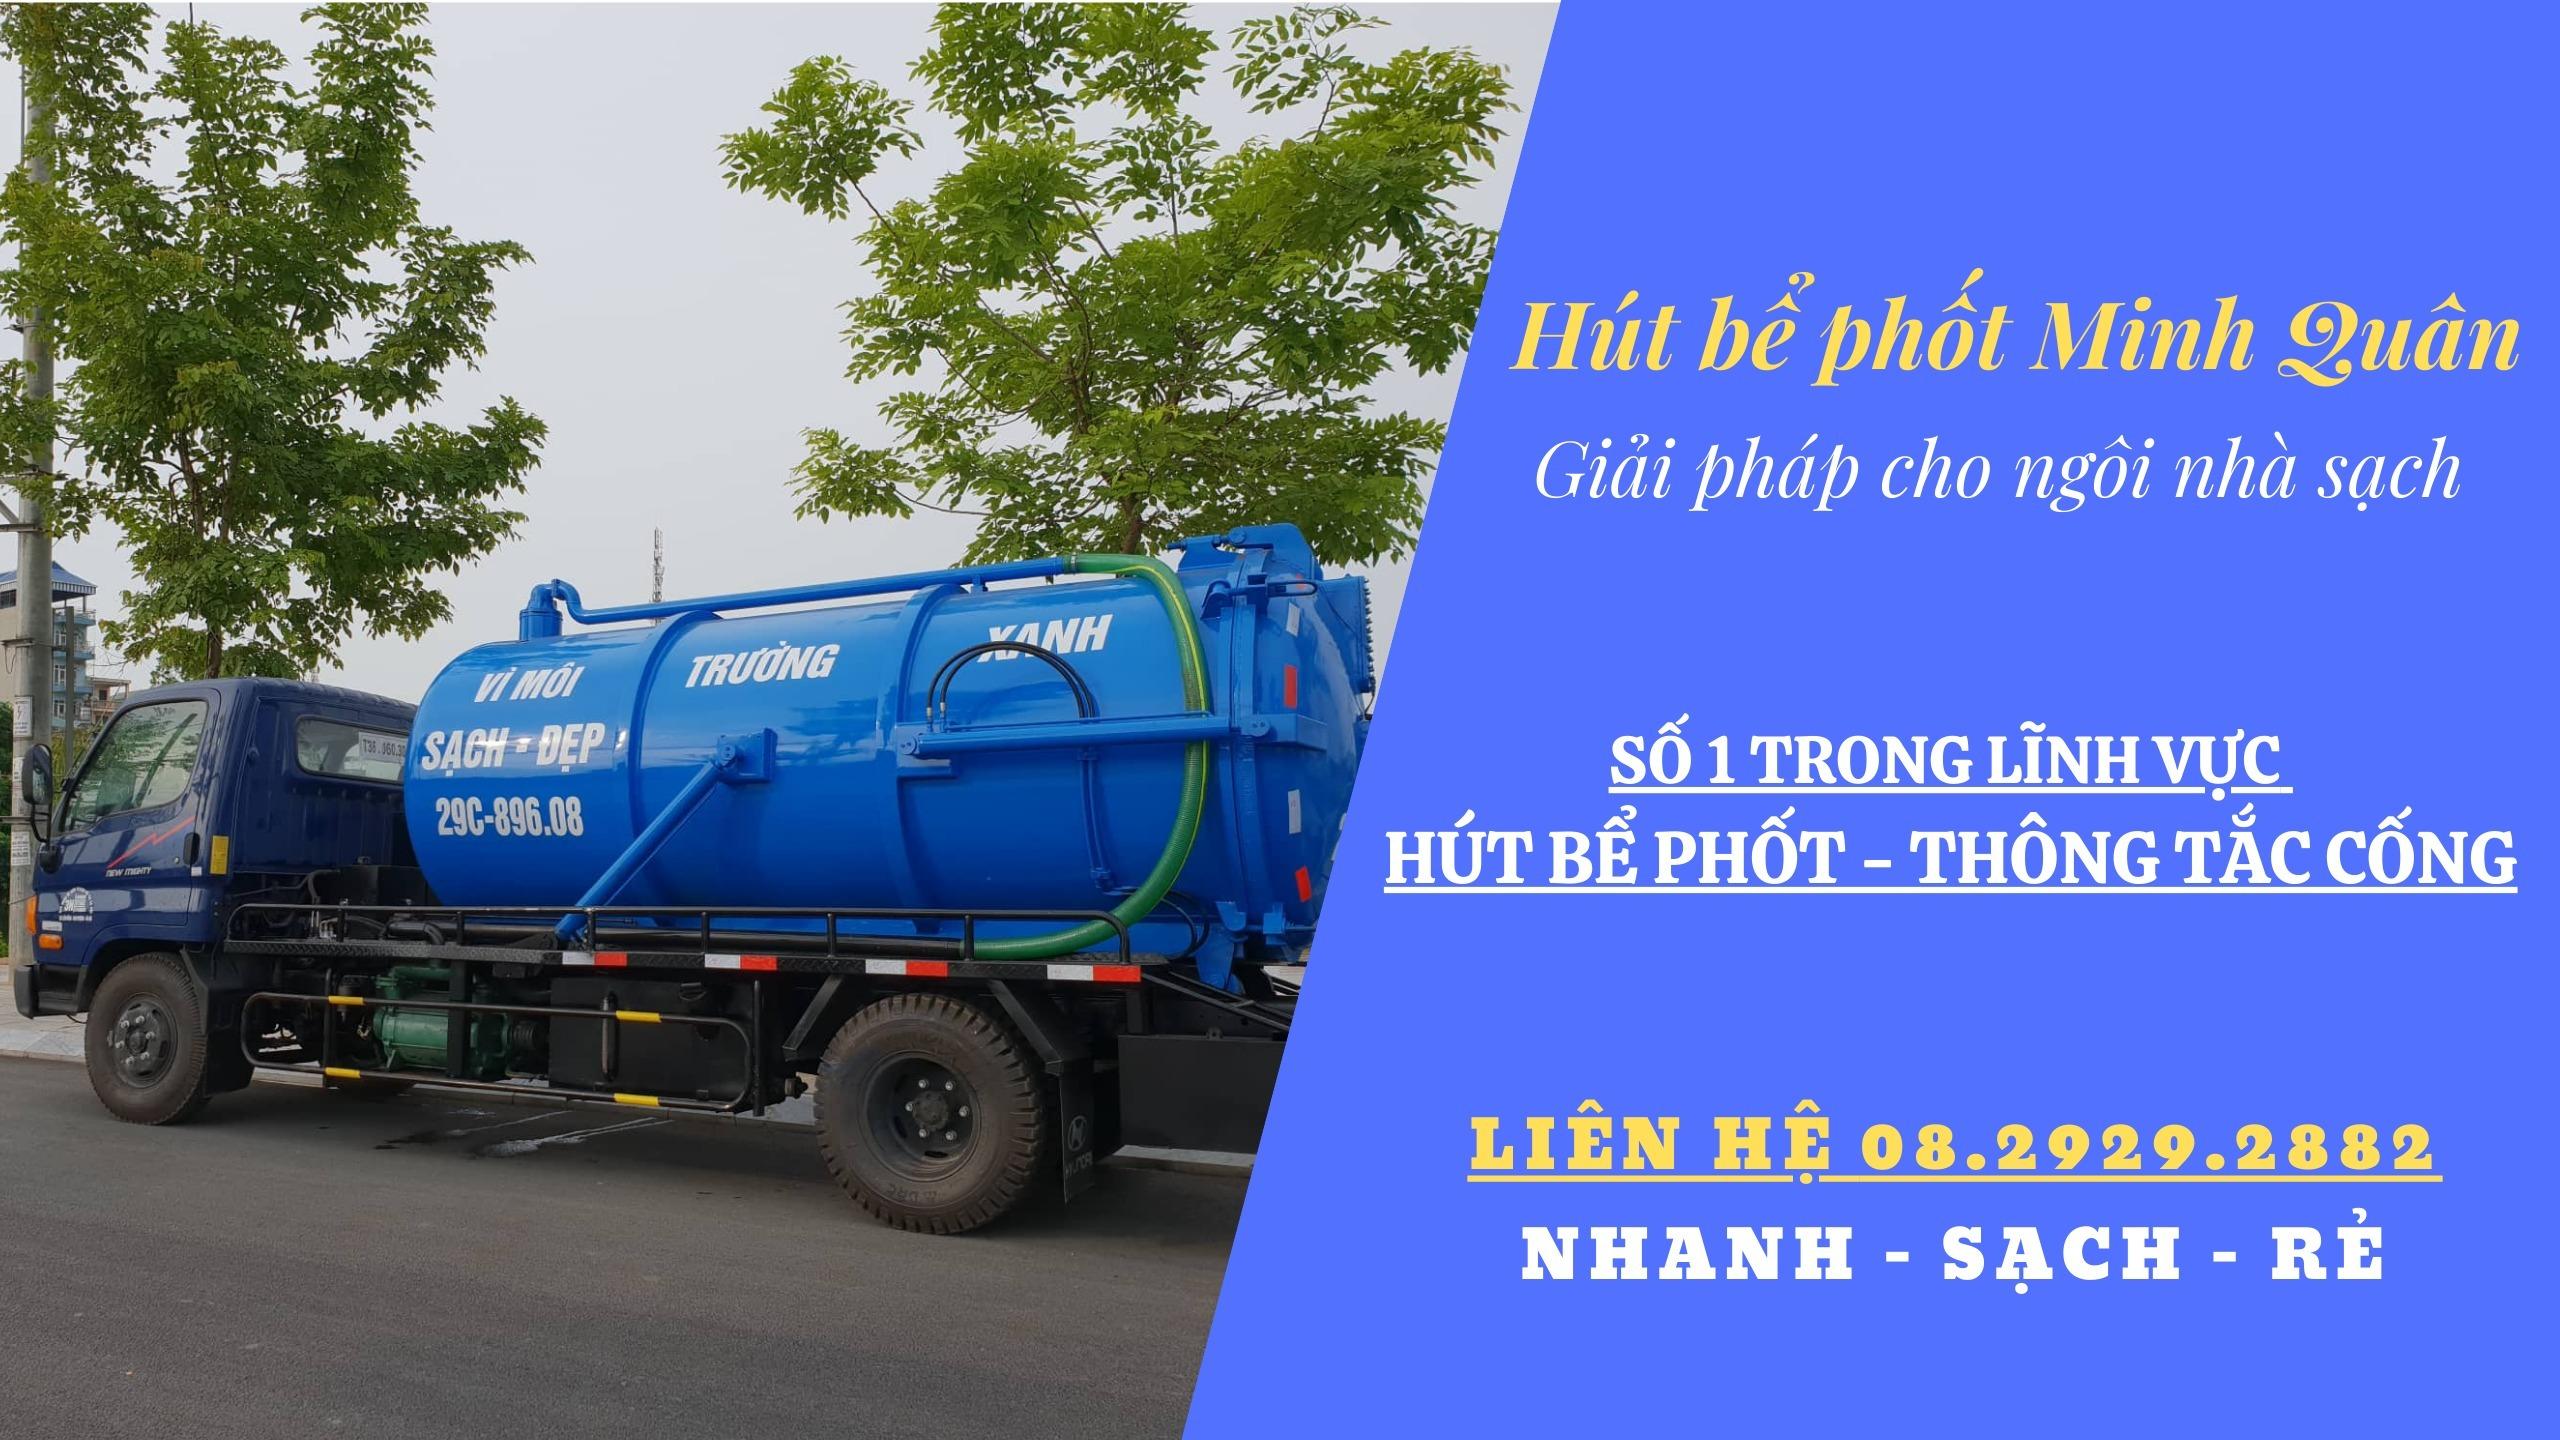 Hút Bể Phốt Minh Quân (@hutbephotminhquan) Cover Image